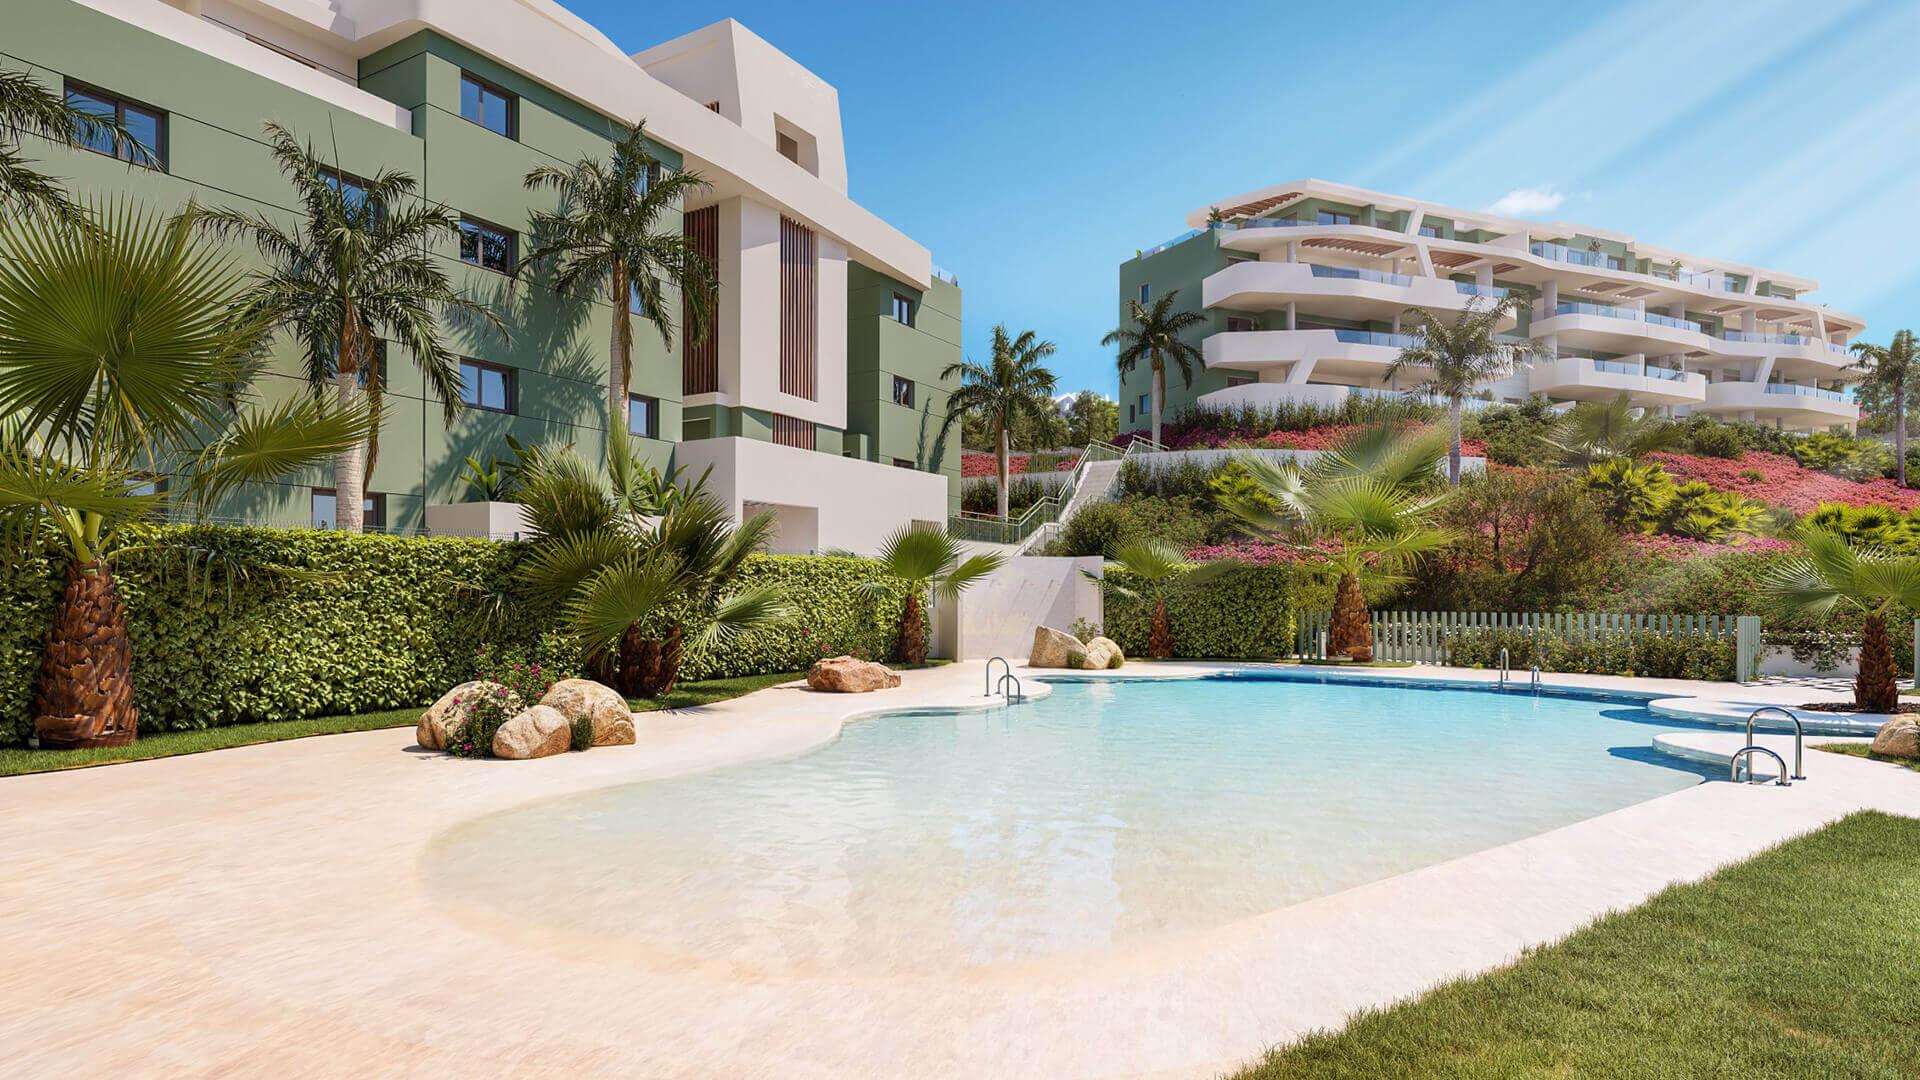 ipanema calanova golf la cala spanje costa del sol nieuwbouw appartement zeezicht zwembad